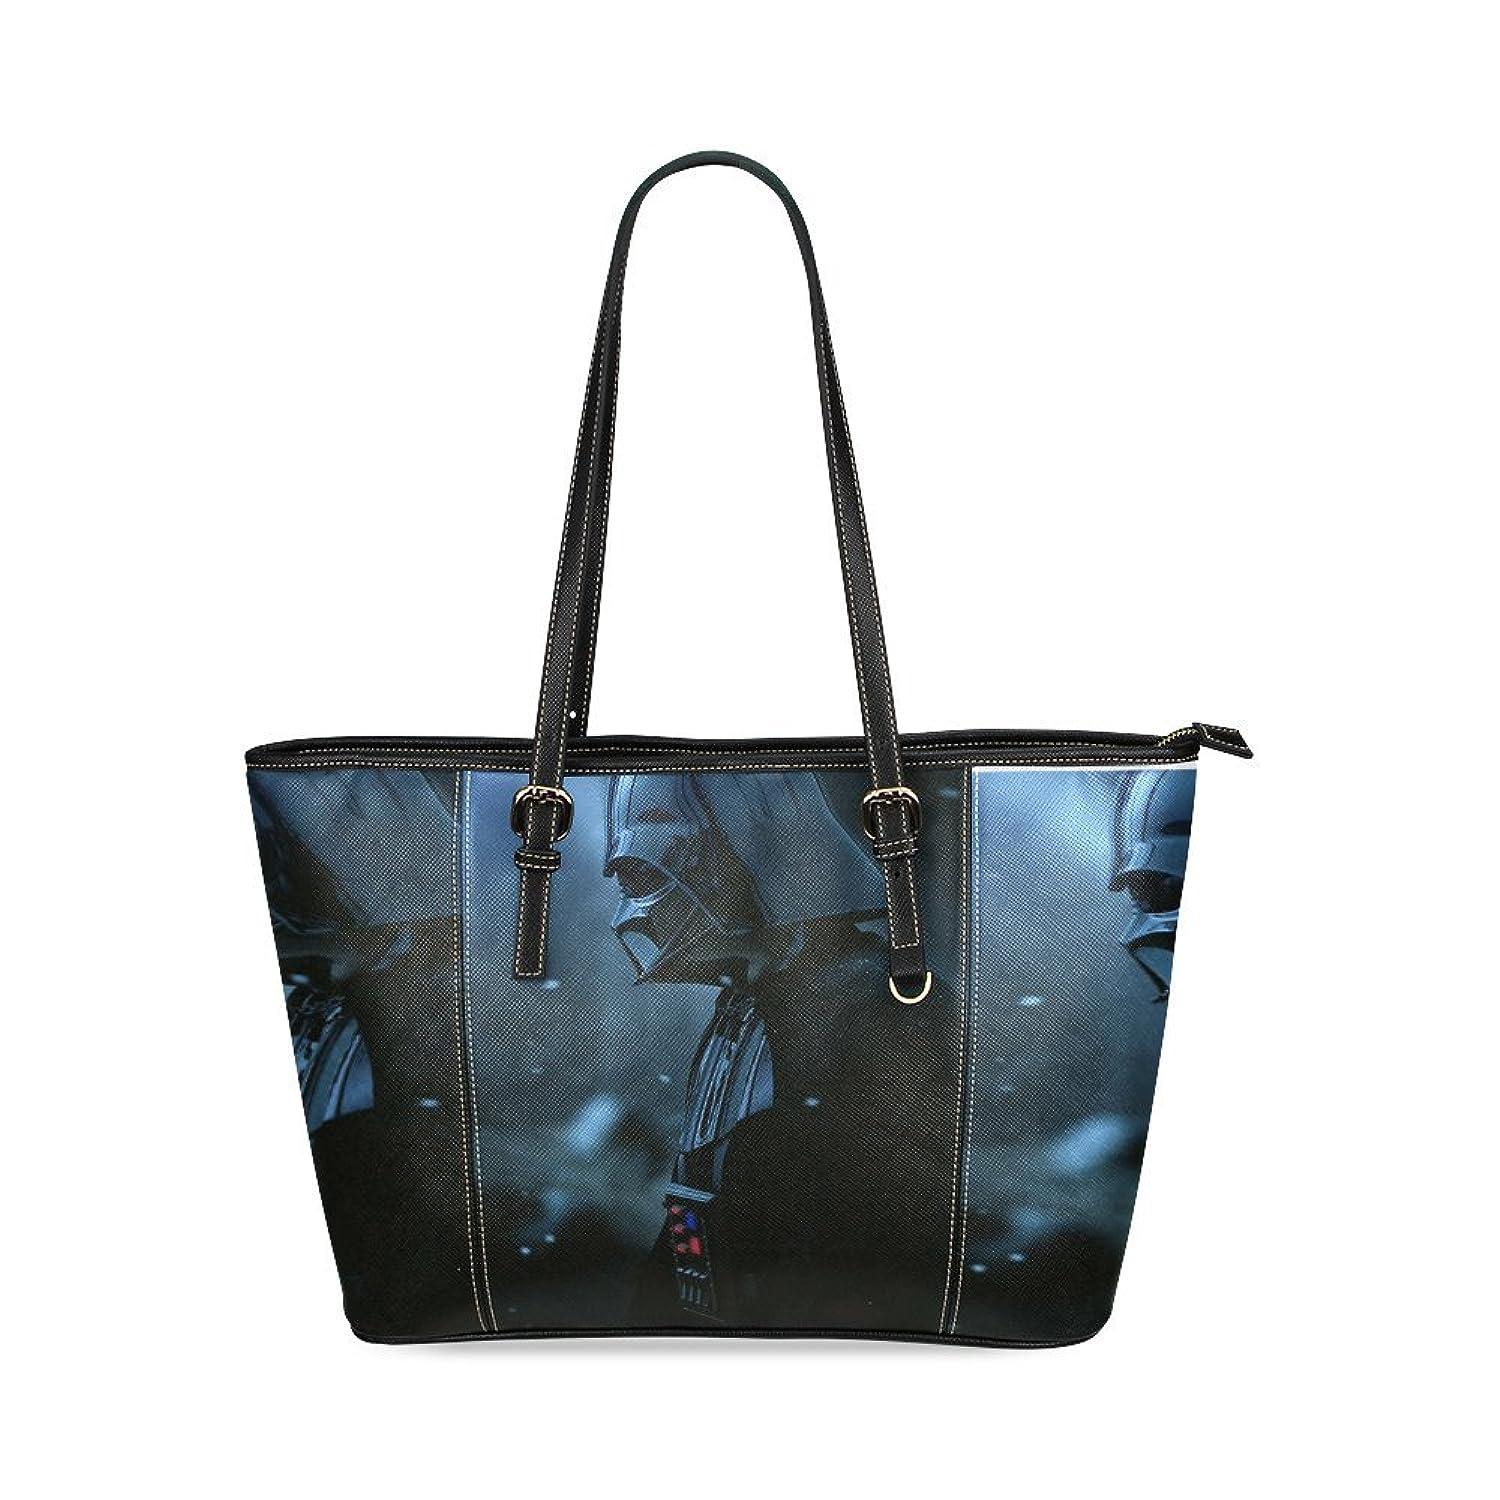 Star Wars Women's Mosaic High-grade PU Leather Large Tote Bag/Handbag/Shoulder Bag